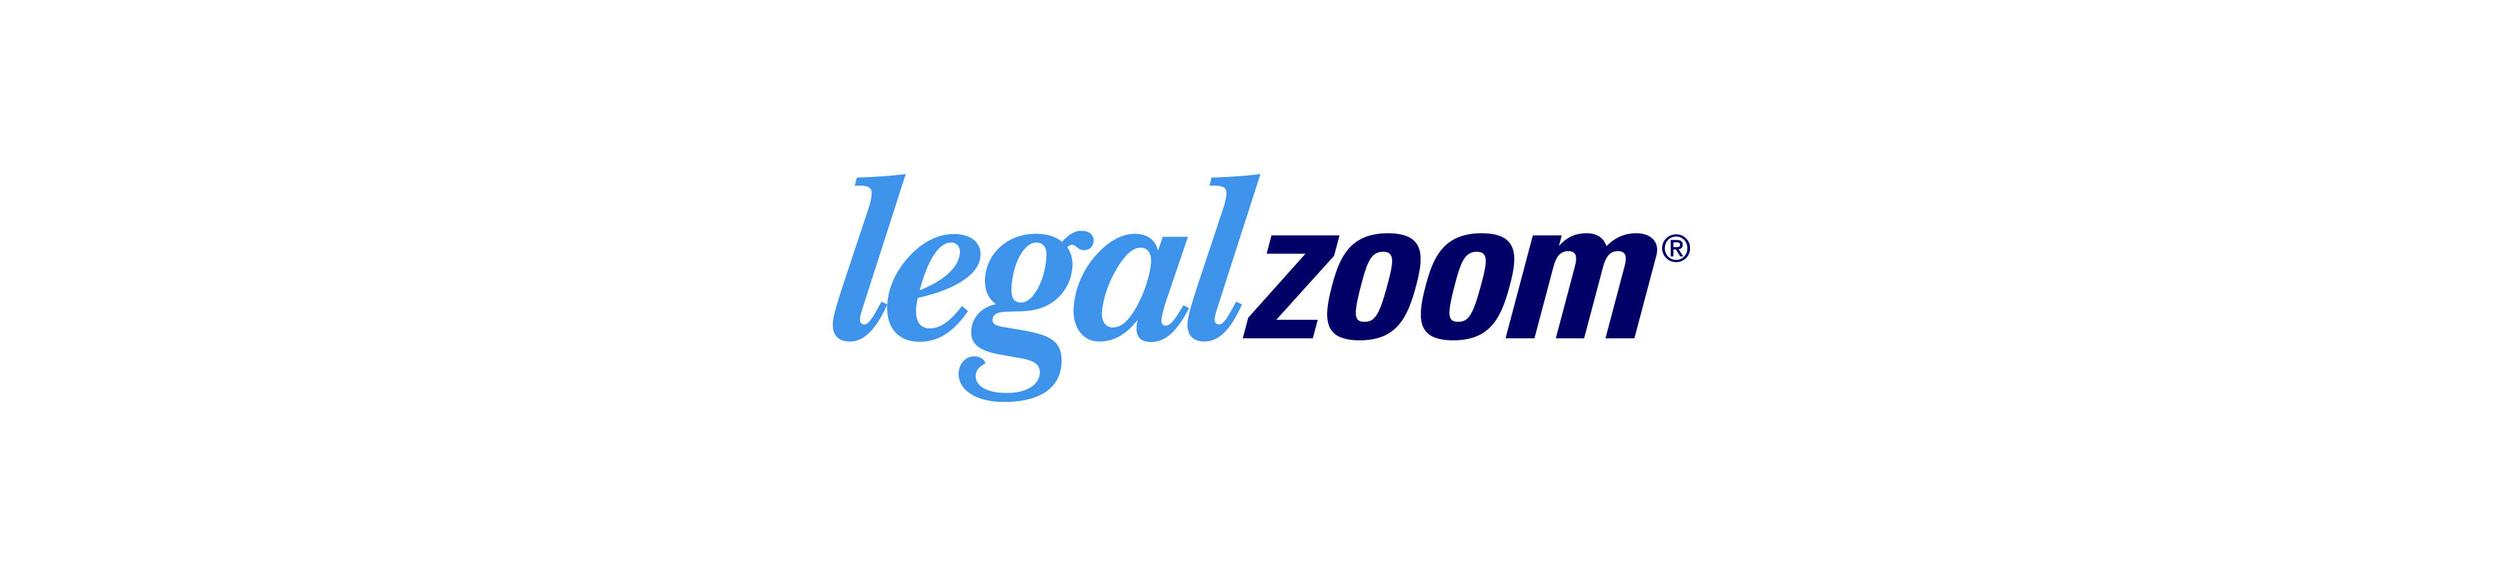 legalzoom_logo_2012_rgb_large.png